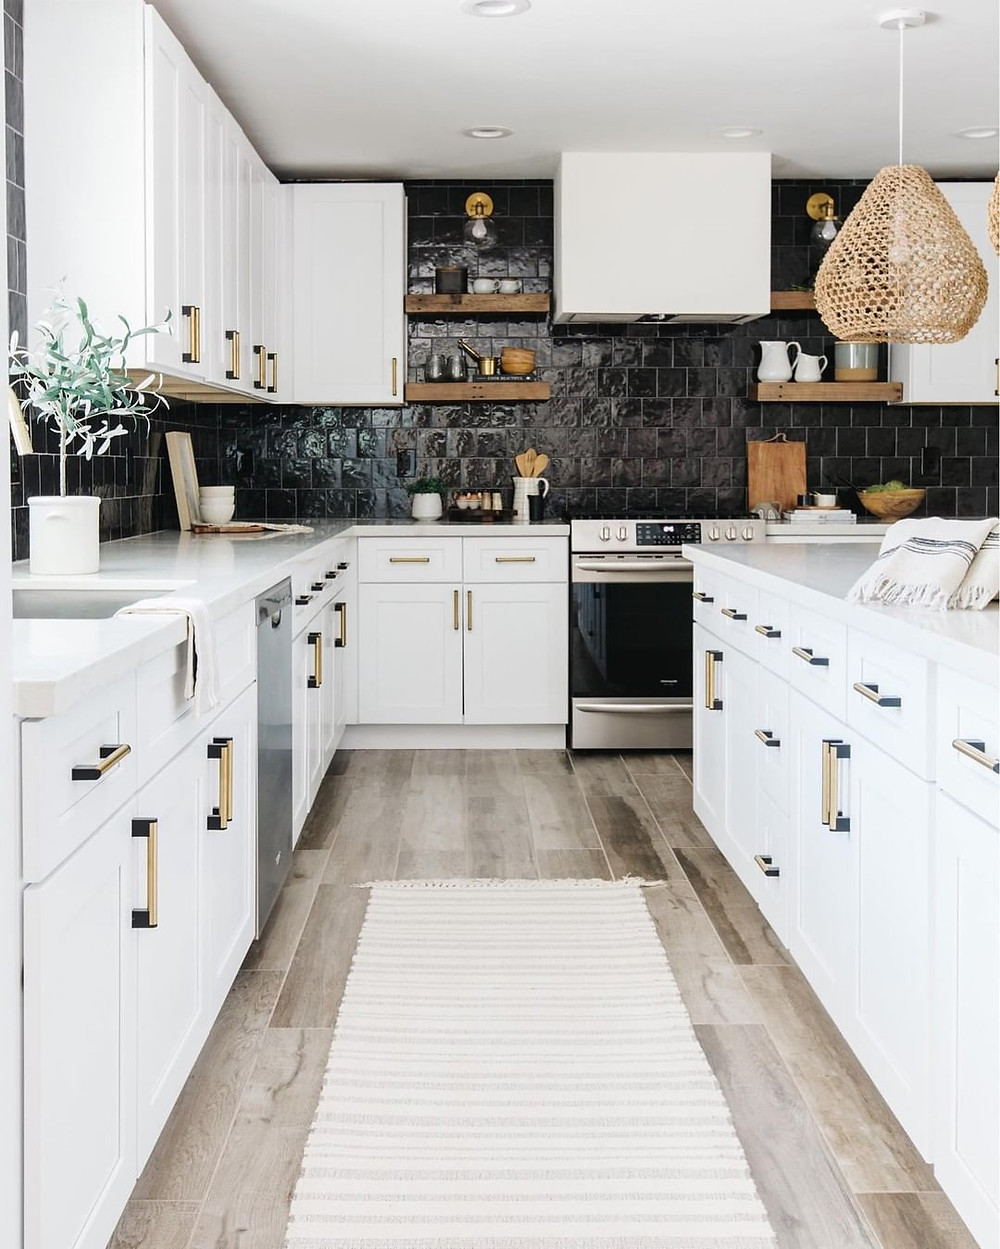 A white kitchen with black backsplash tiles and grey hardwood flooring